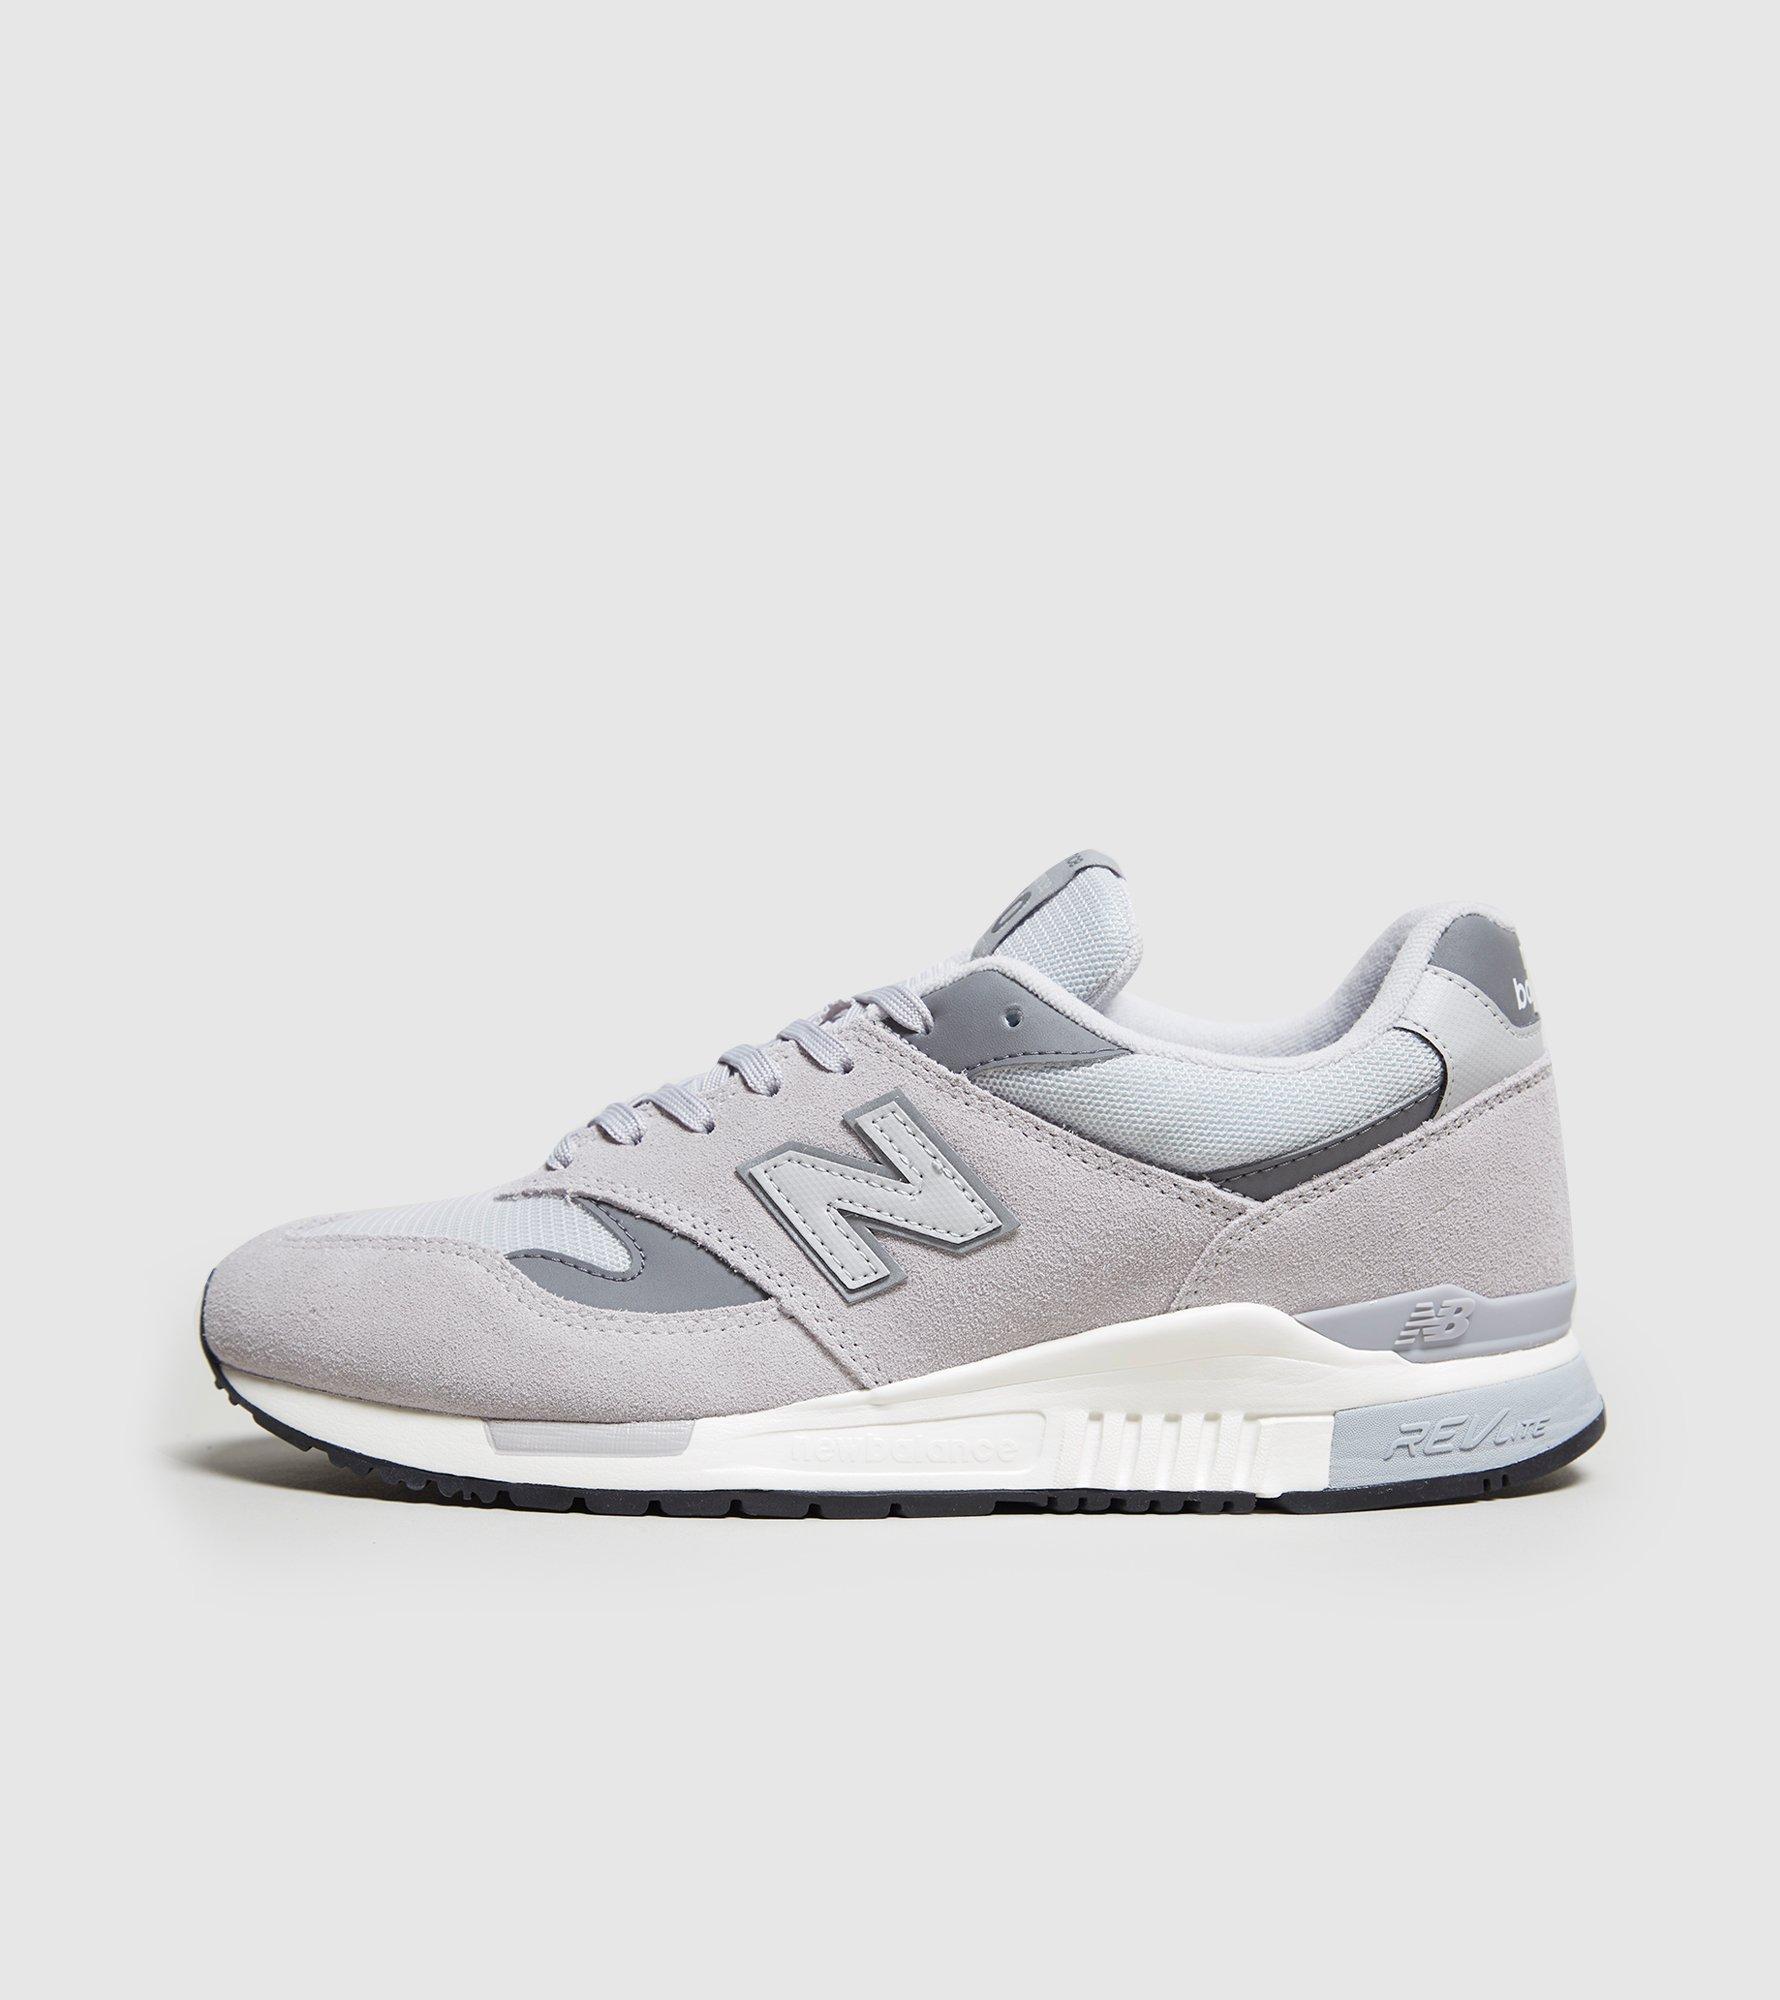 New Balance 840 ...